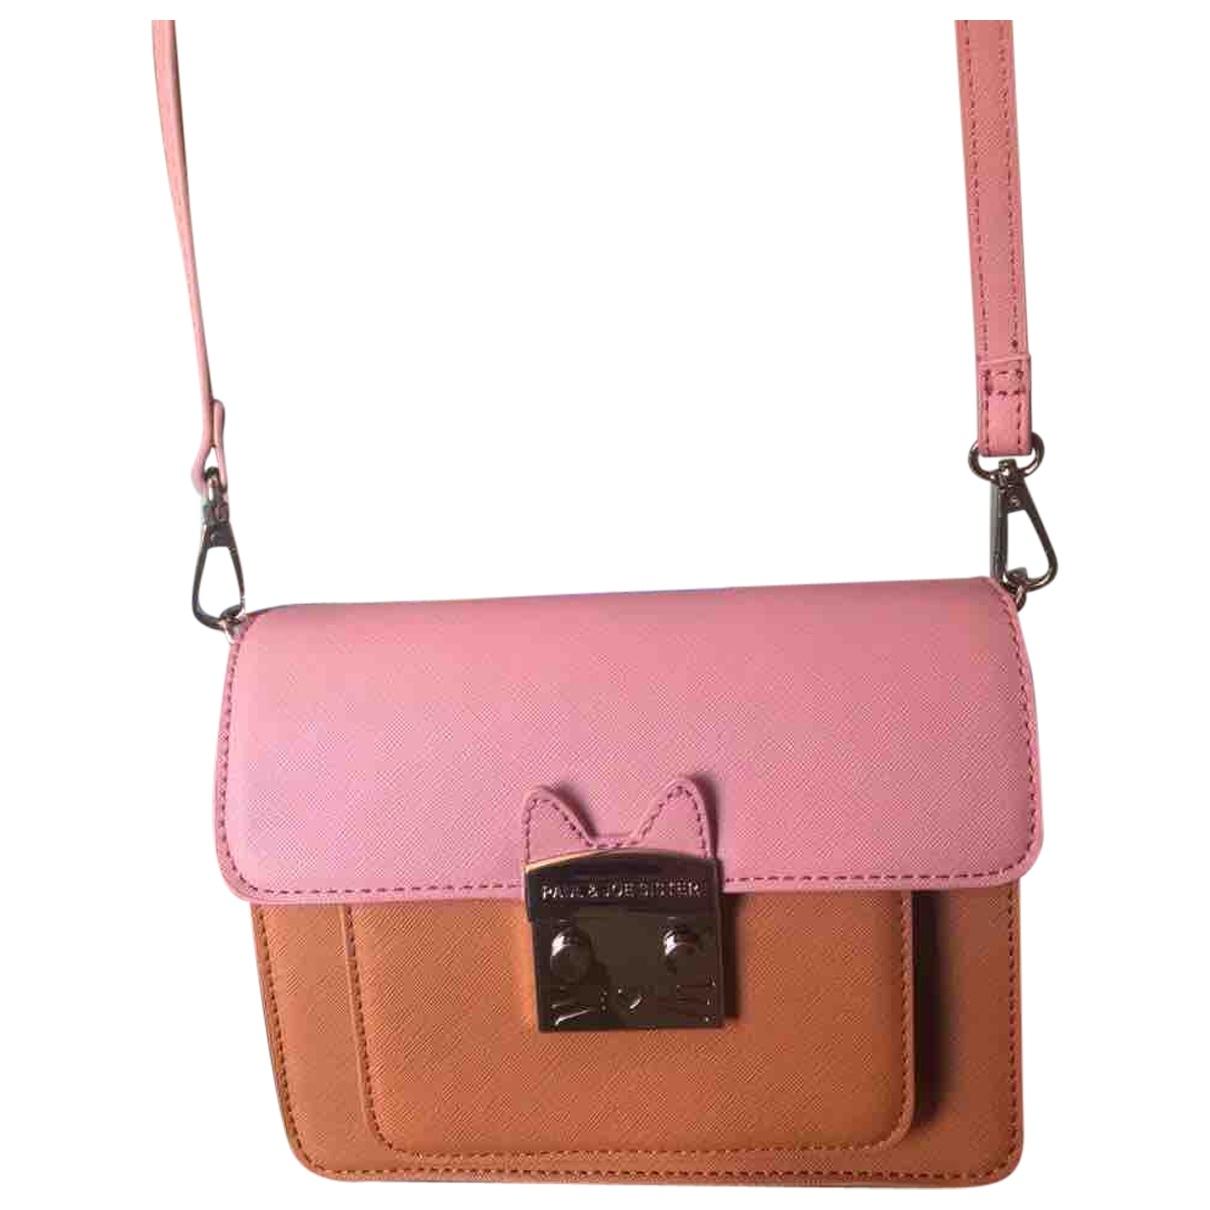 Paul & Joe Sister \N Pink handbag for Women \N